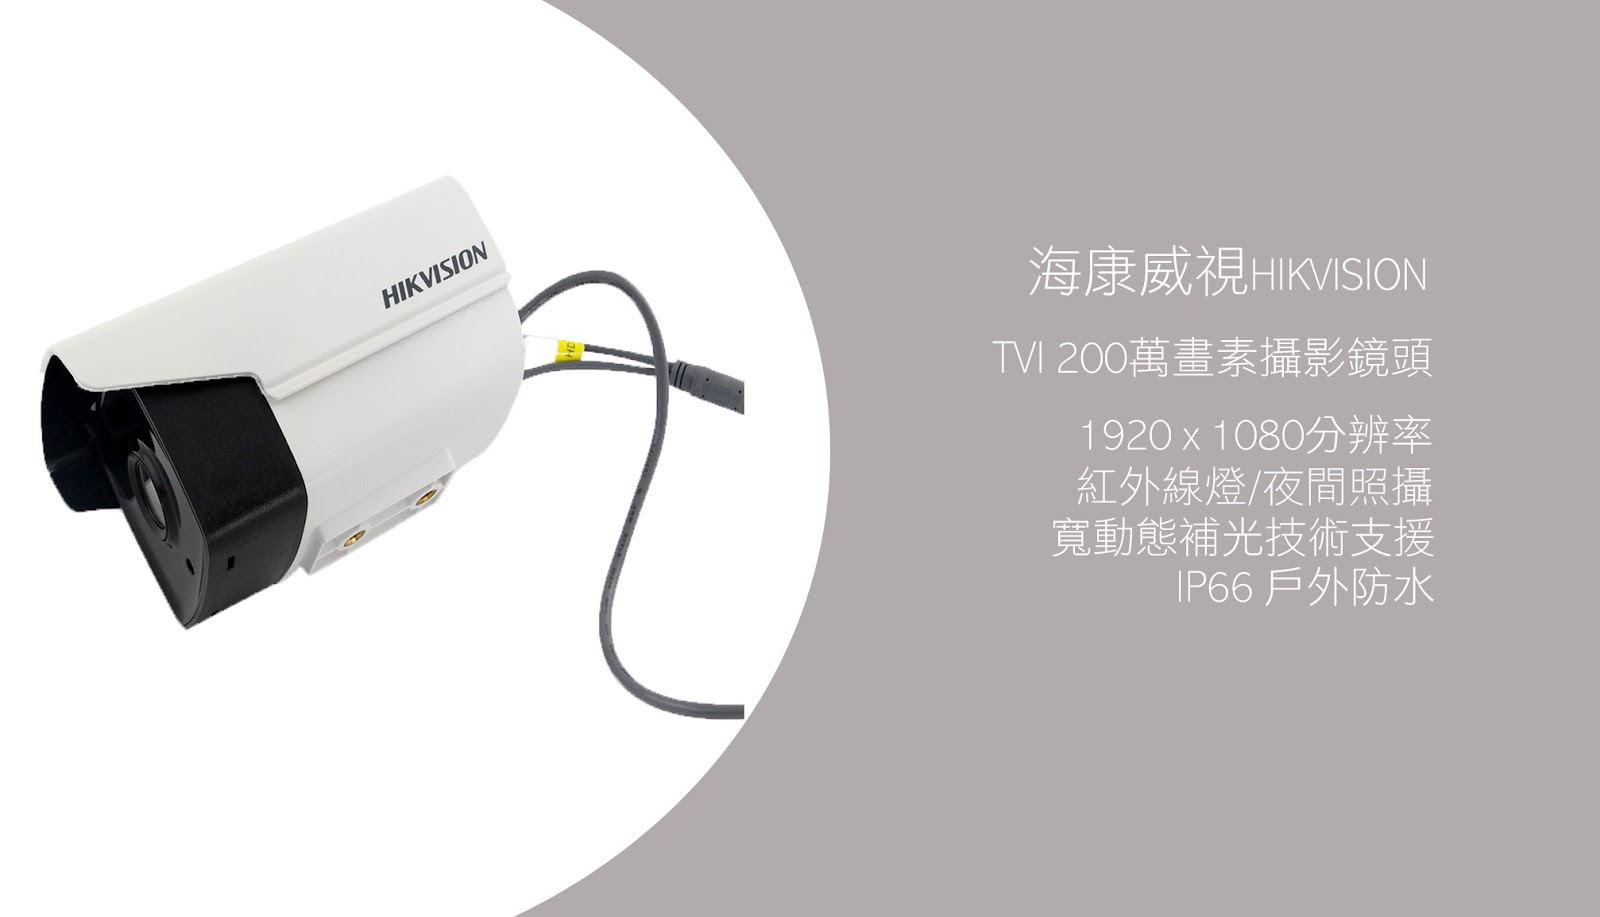 REC銳科安防監控x HD高畫質監視器 x 專業規畫‧安裝‧維修 0800-255-001 : 《 HD 監視器 x 鏡頭系列